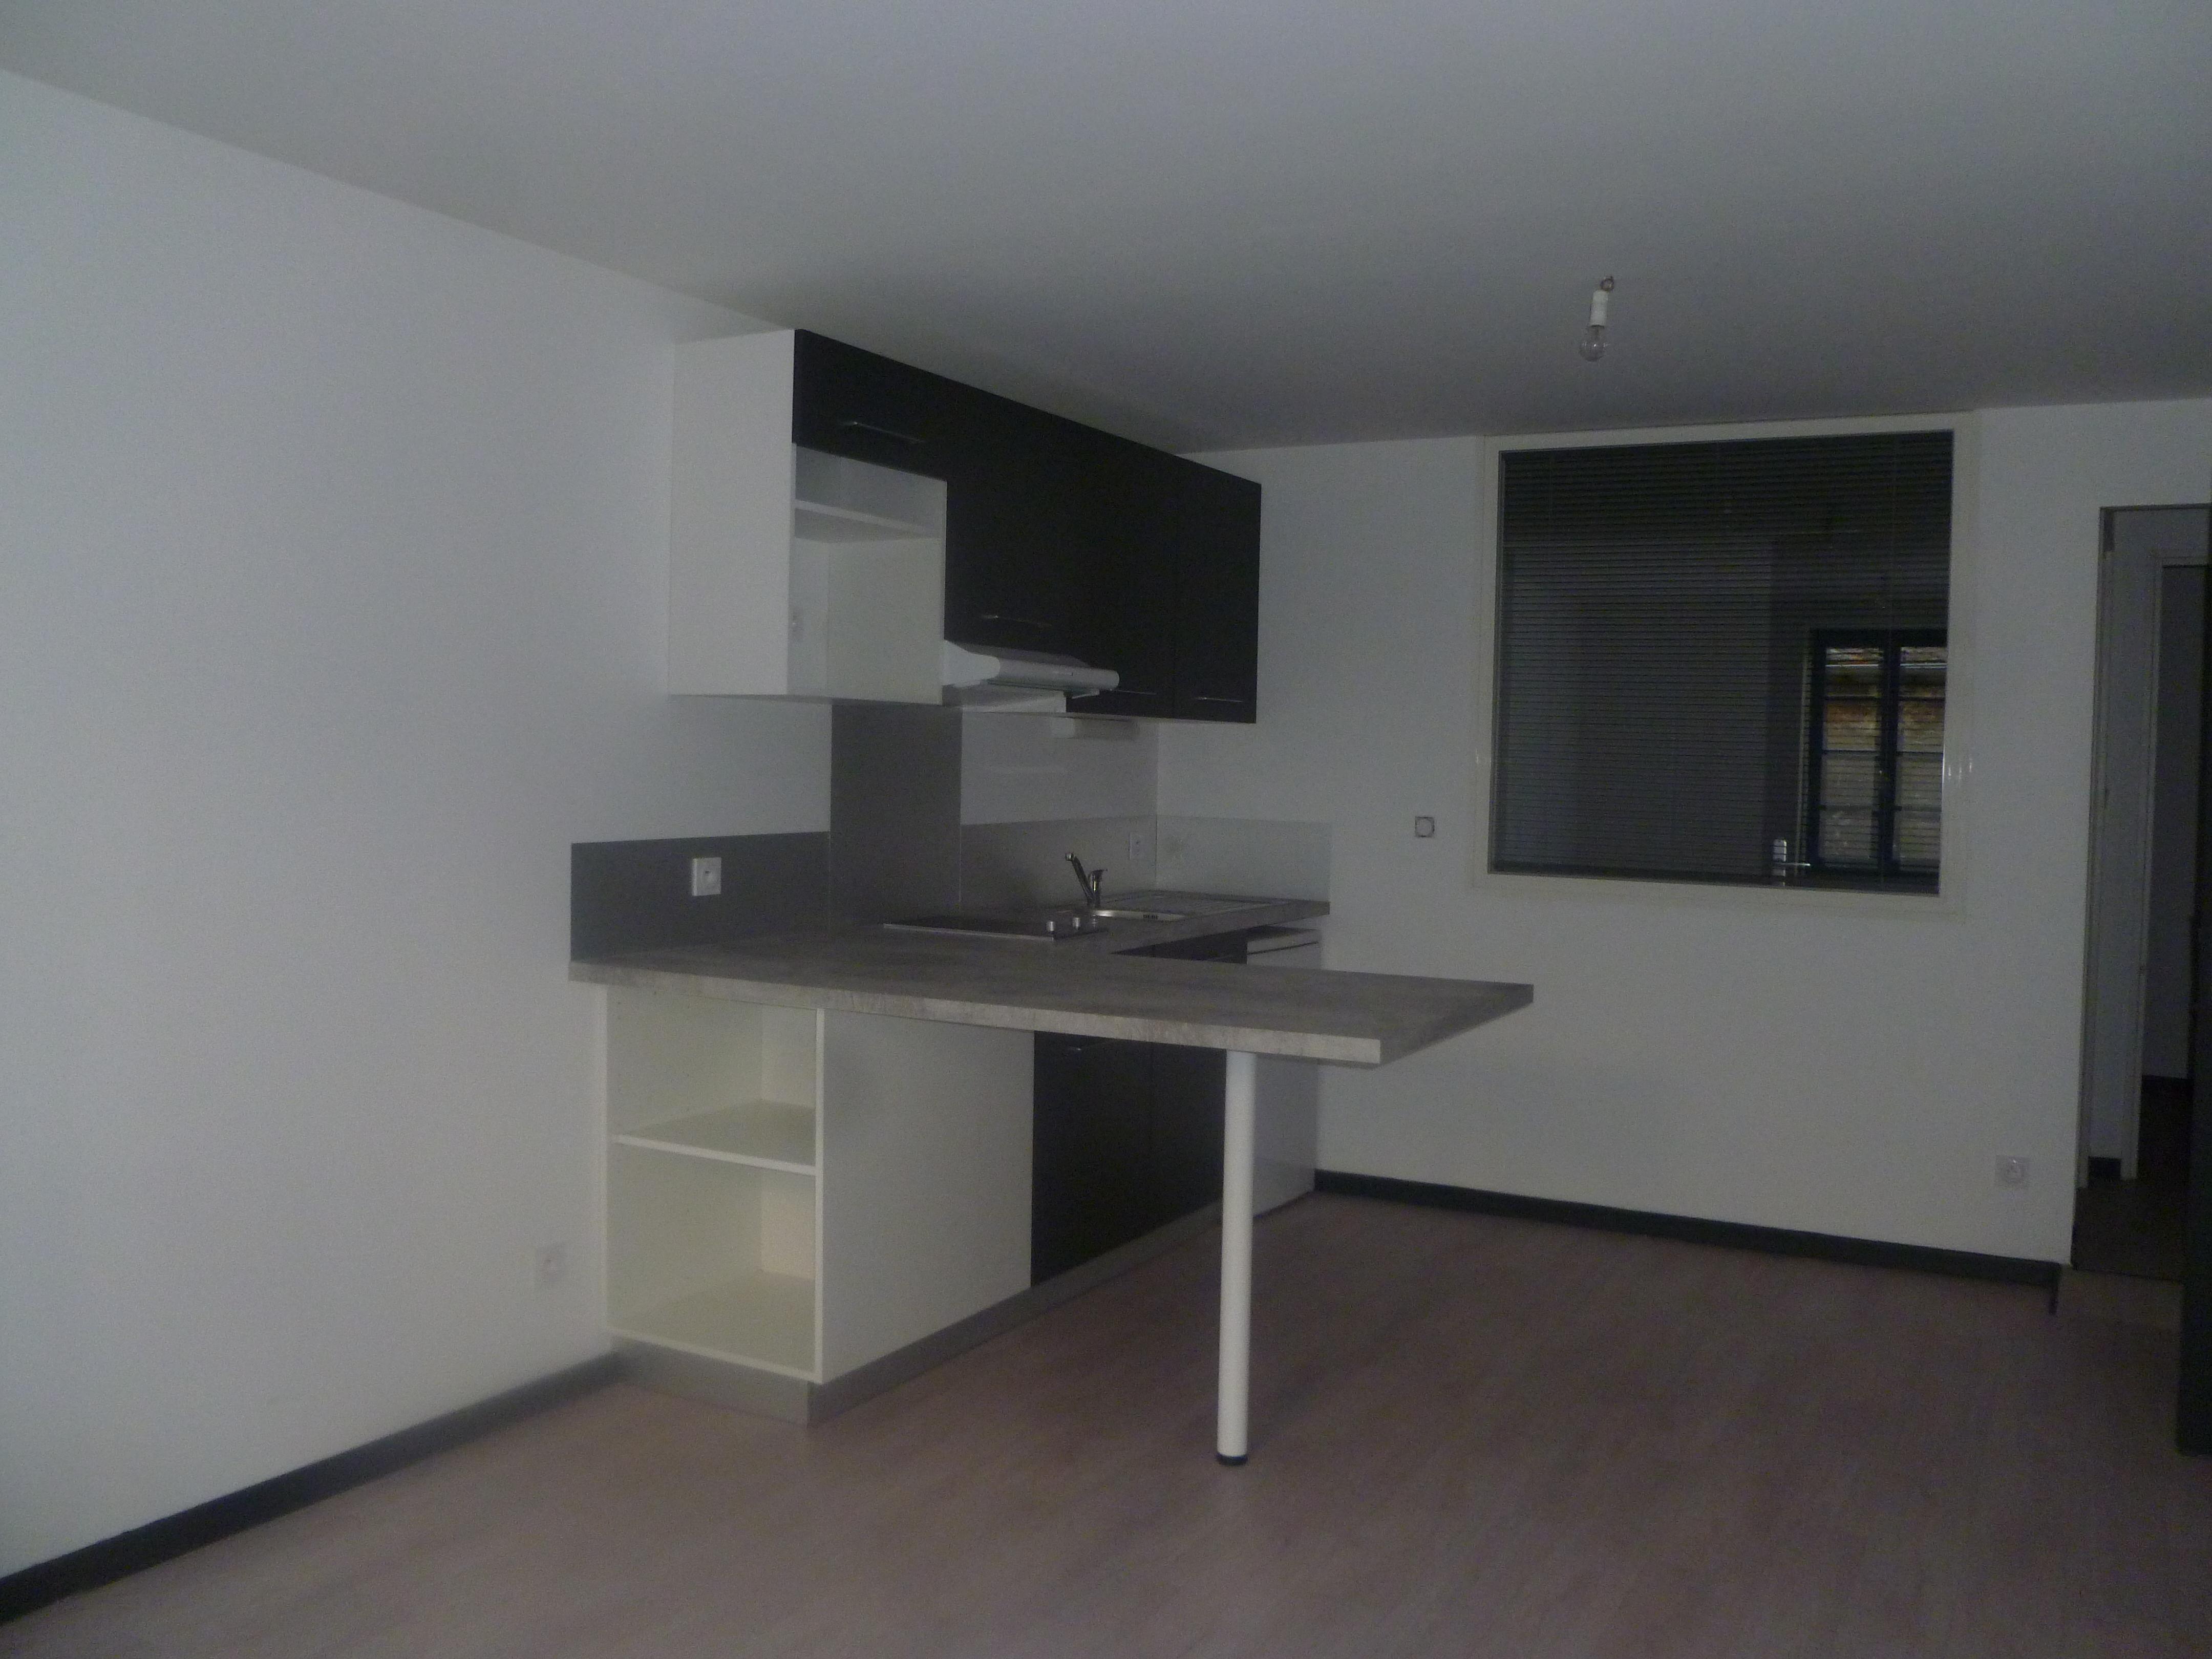 Appartement T2 neuf à louer à FIGEAC centre